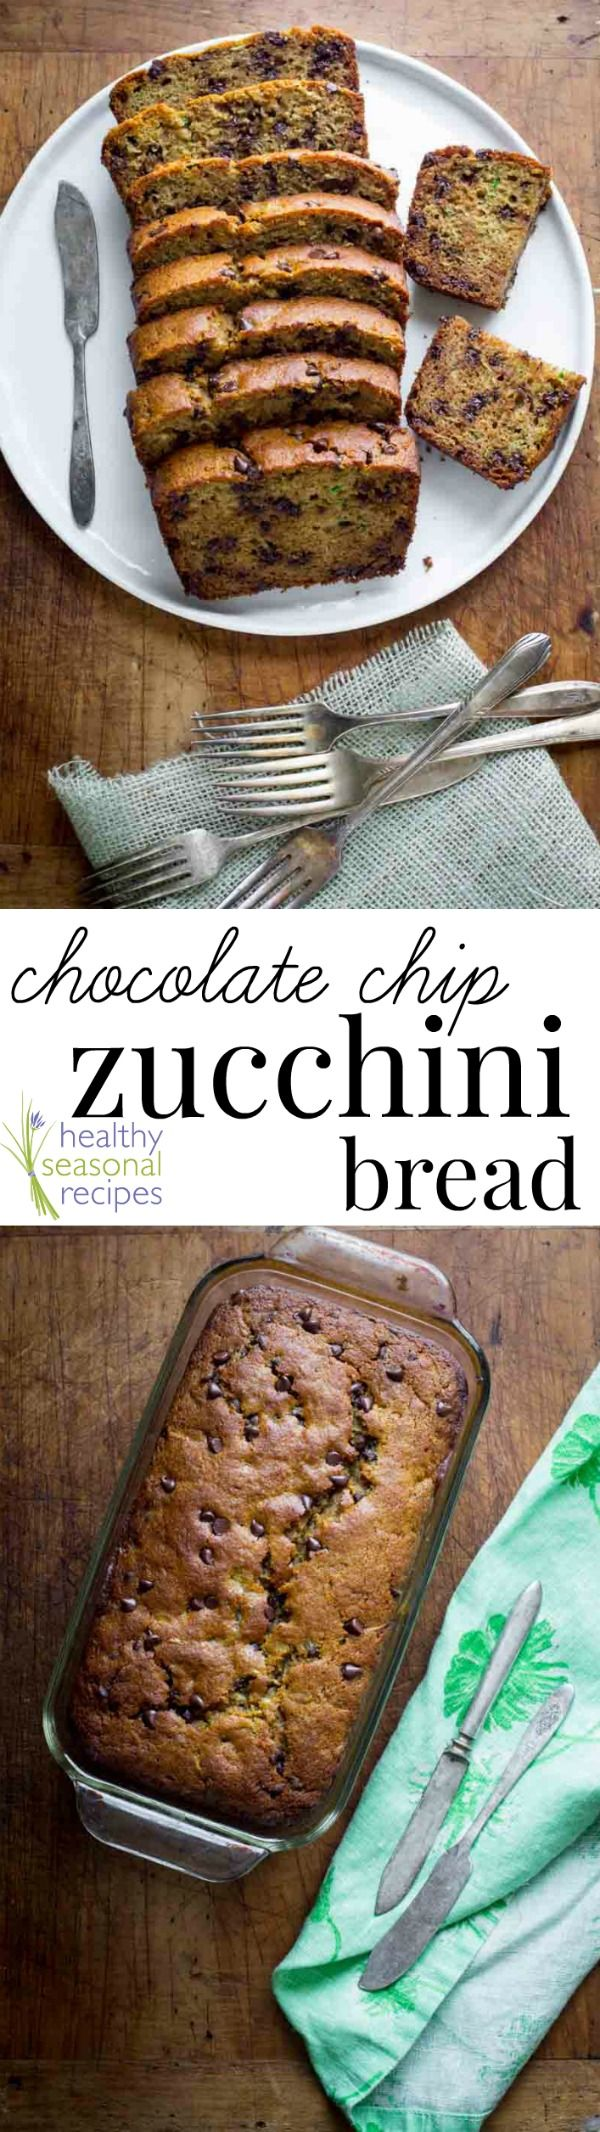 chocolate chip zucchini bread - Healthy Seasonal Recipes